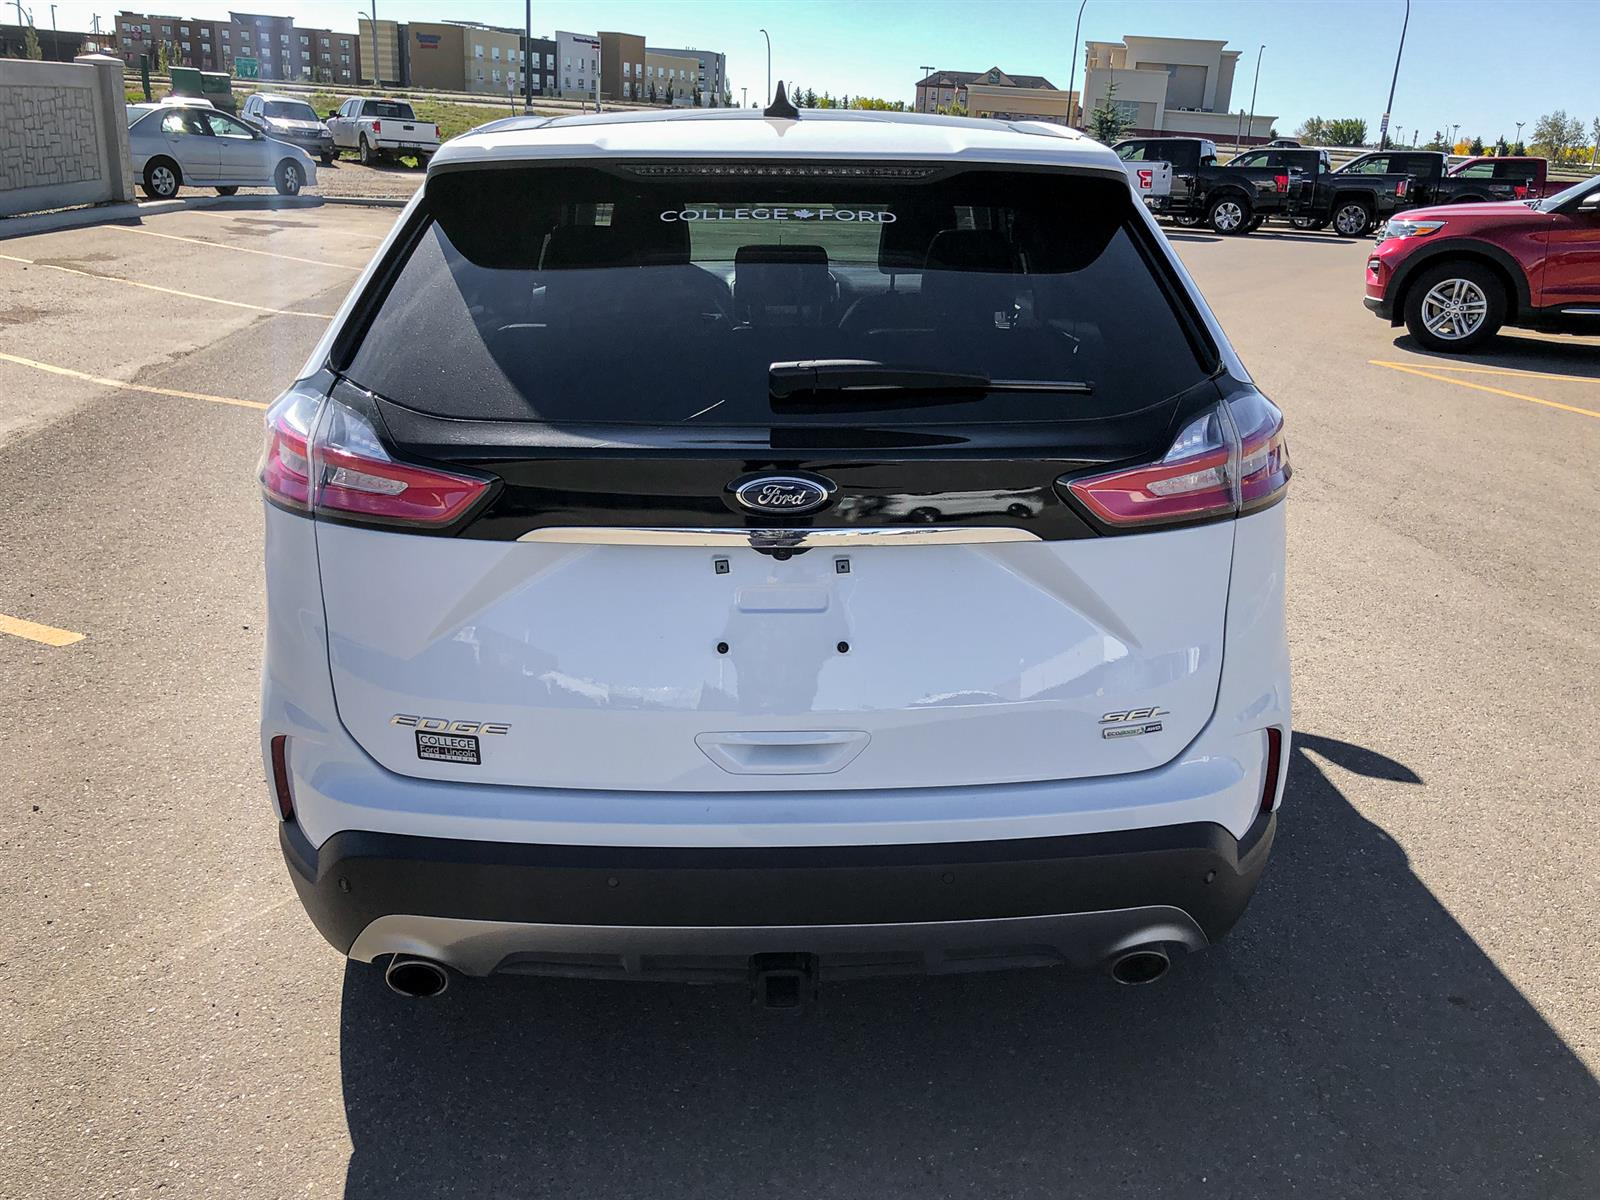 2020 Ford Edge SEL   2.0L I4 ECOBOOST   AWD   NAVIGATION SYSTEM   HEATED STEERI